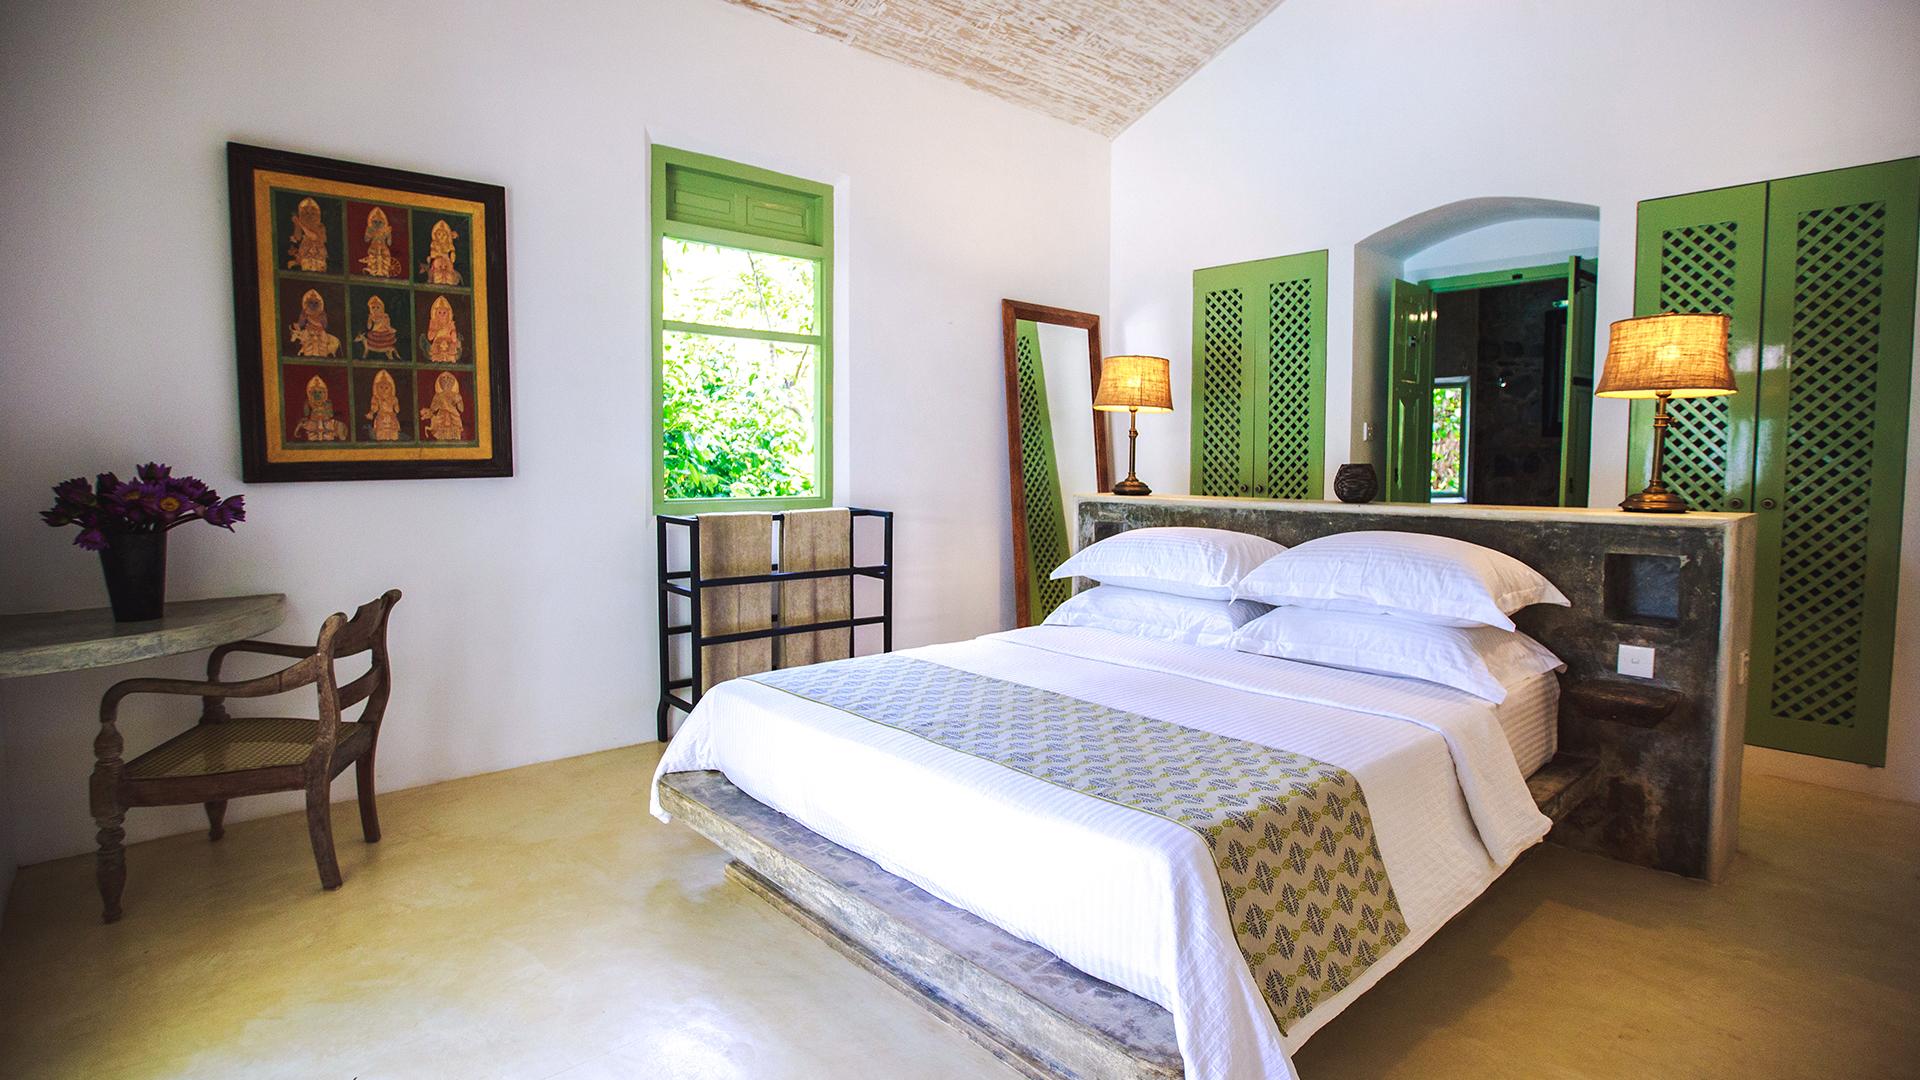 Sri_lanka_holiday_villa_gab_family_honeymoon_suiteArtboard 1 copy.jpg